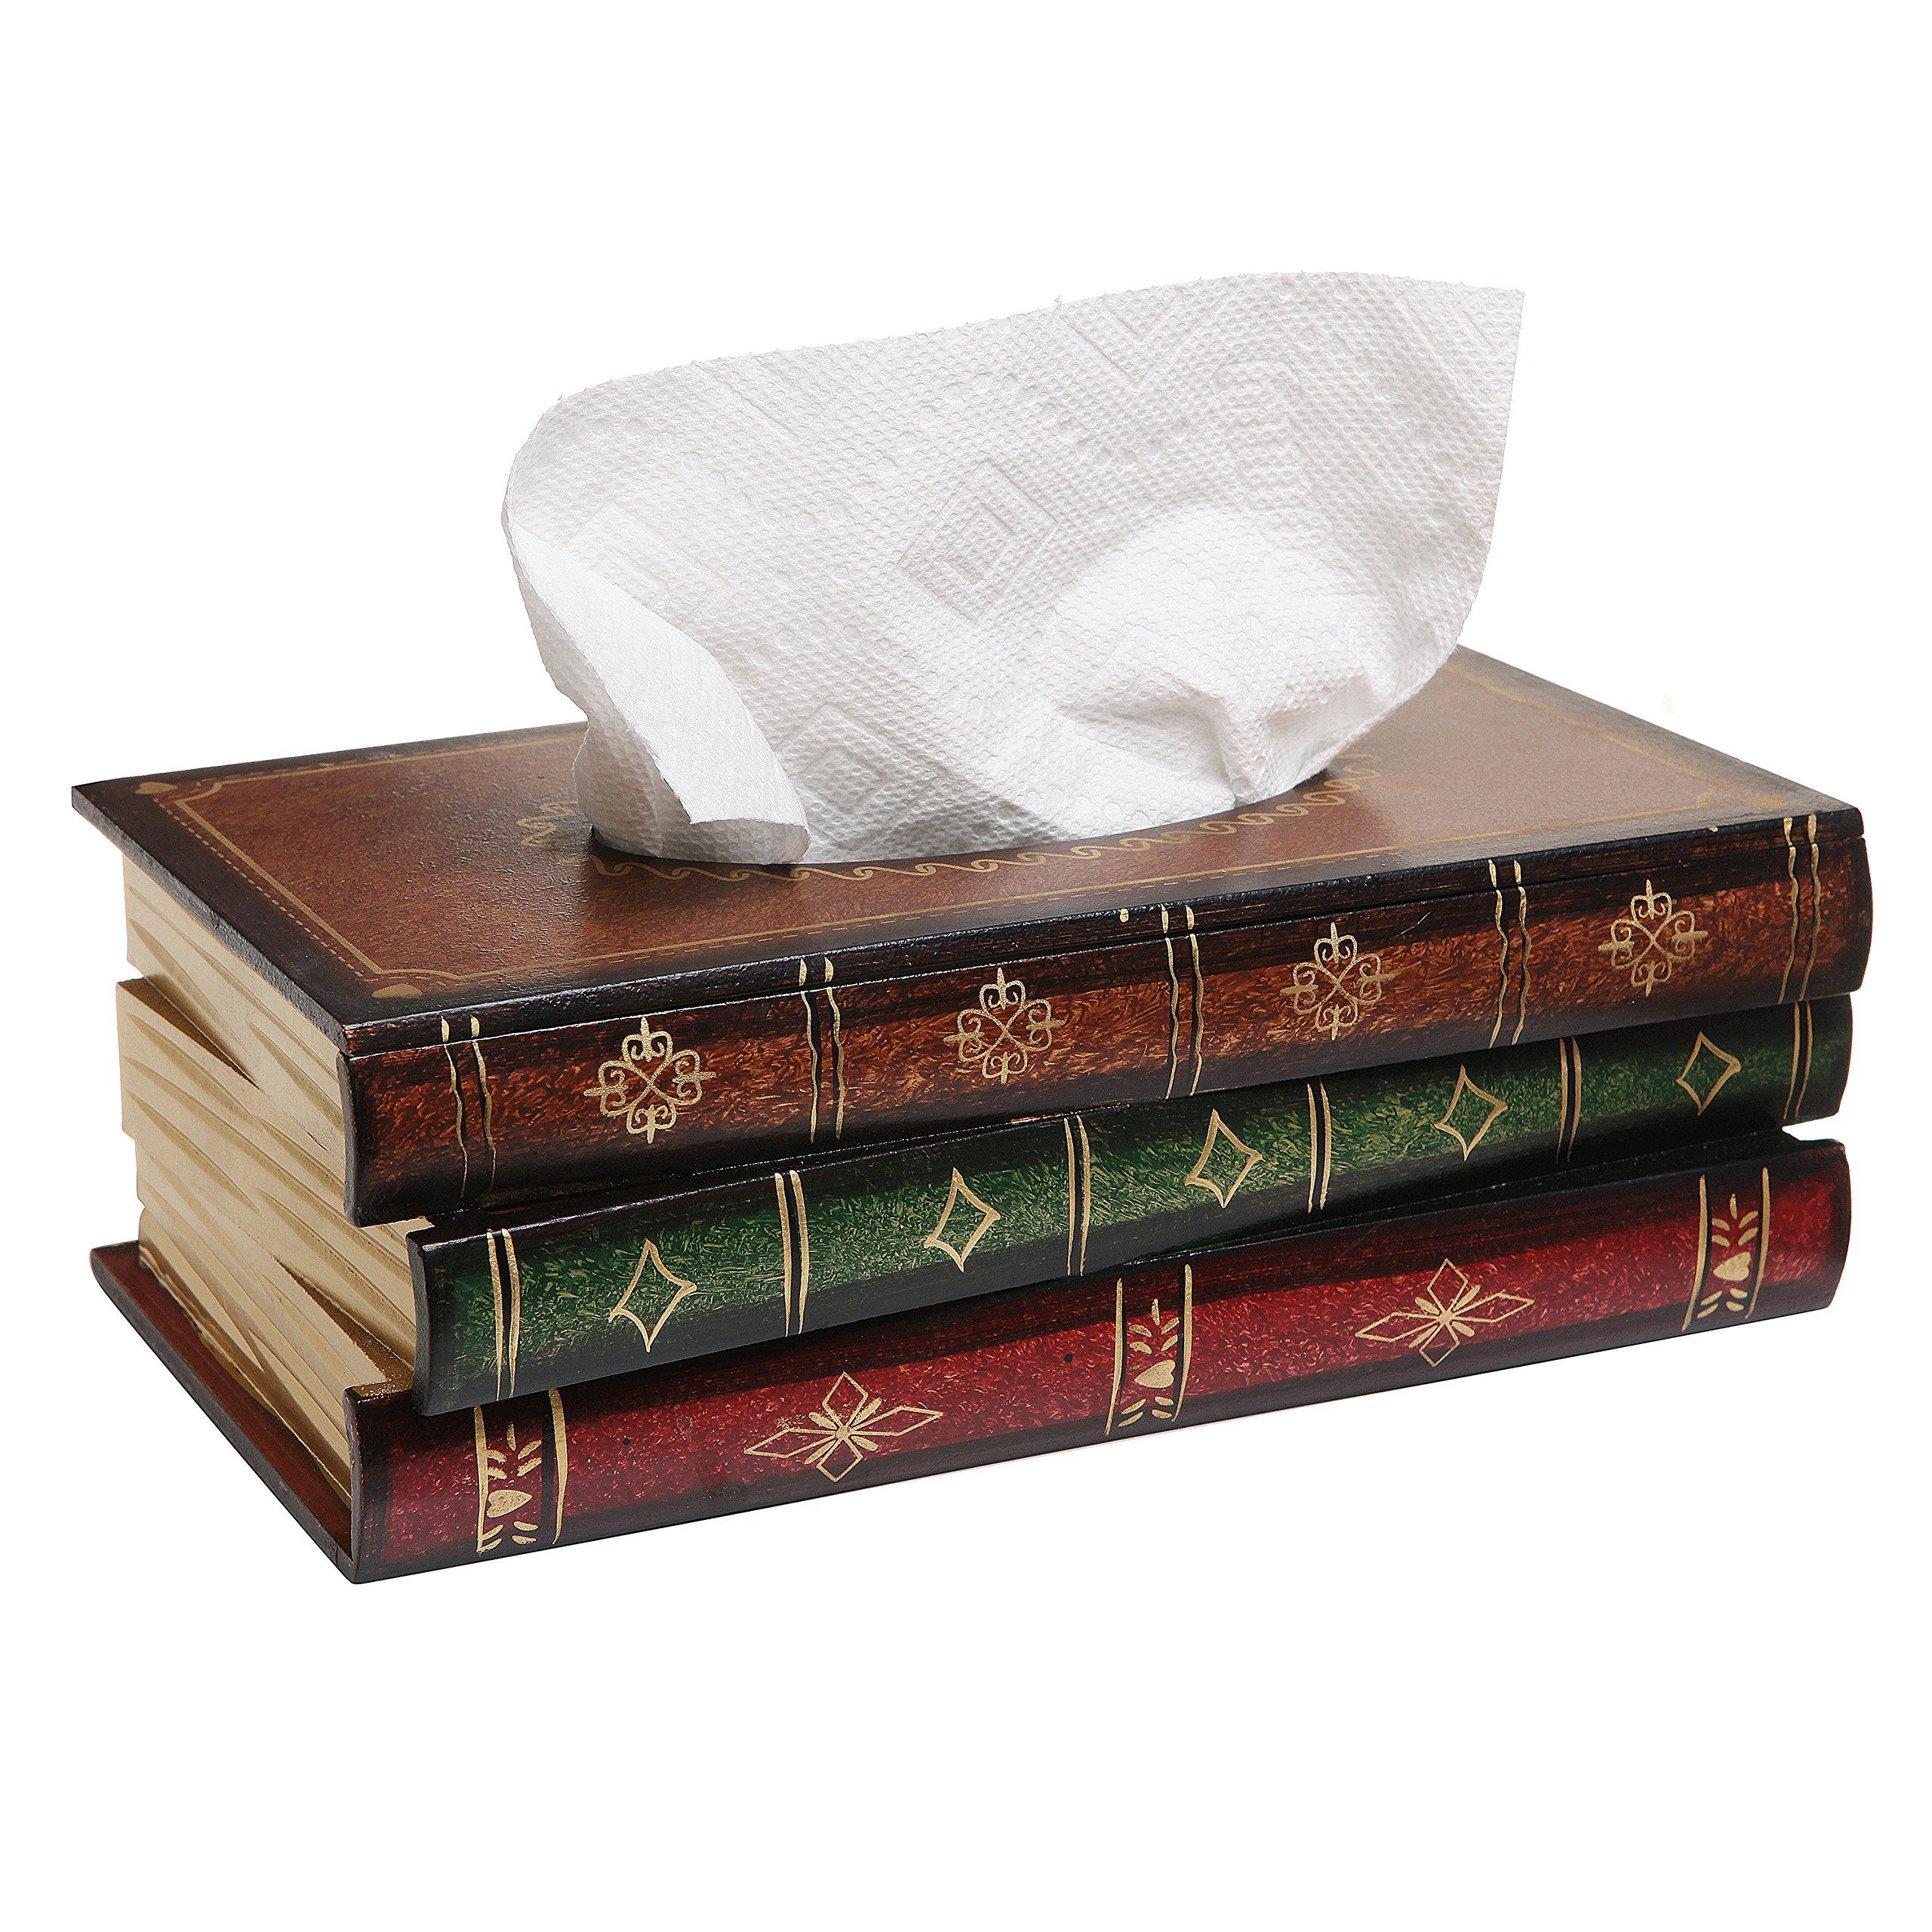 Antique Book Design Wood Bathroom Facial Tissue Dispenser Box Cover/Novelty Napkin Holder - MyGift